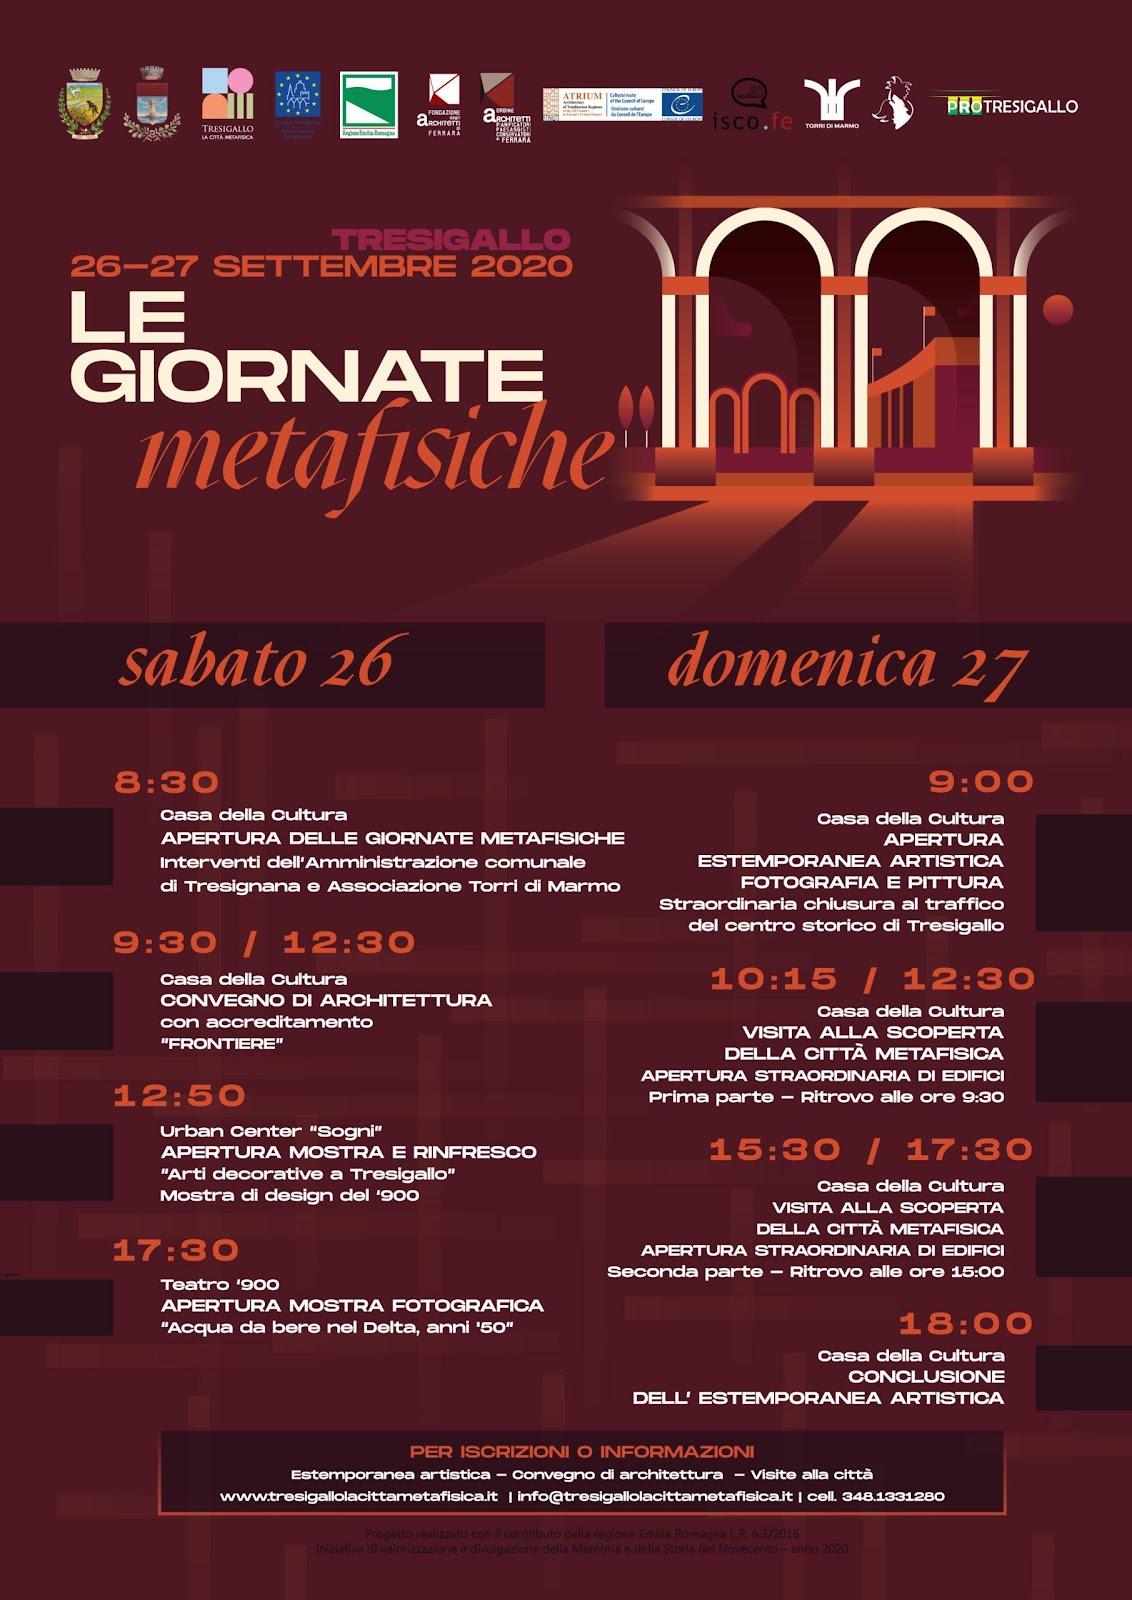 https://www.tresigallolacittametafisica.it/wp-content/uploads/2020/09/Locandina-Le-Giornate-Metafisiche-2020-scaled.jpg